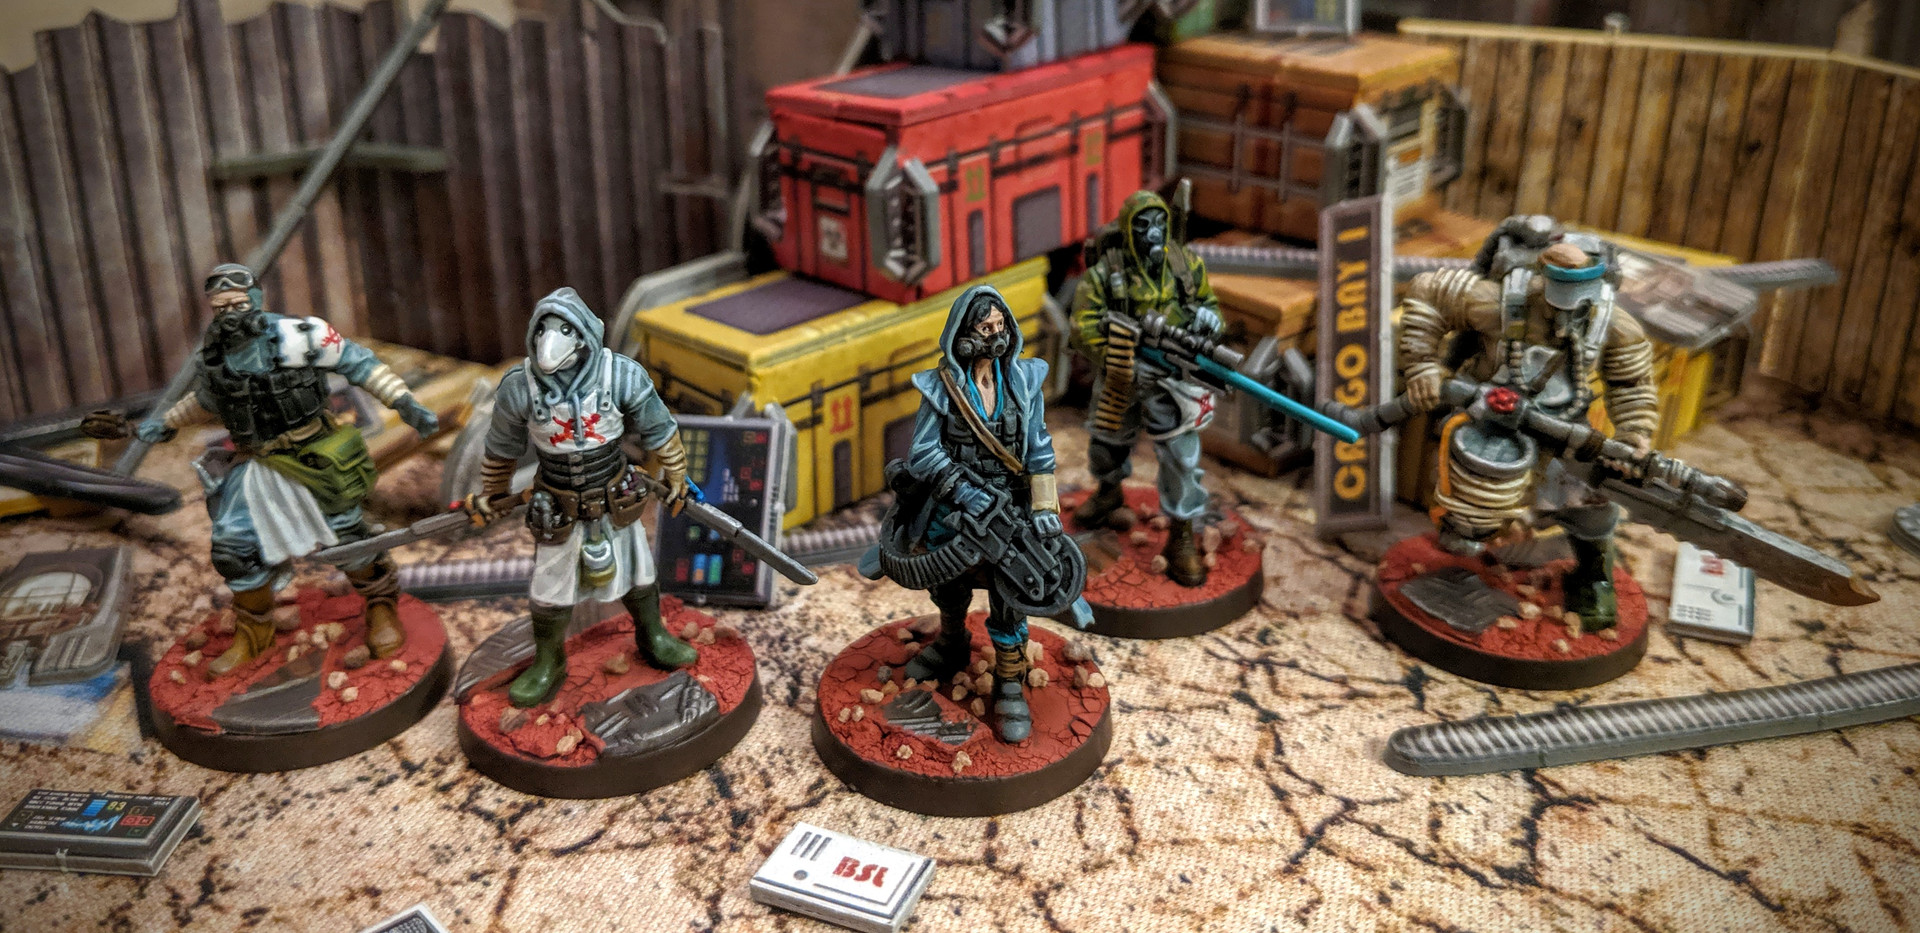 The Plague Gang